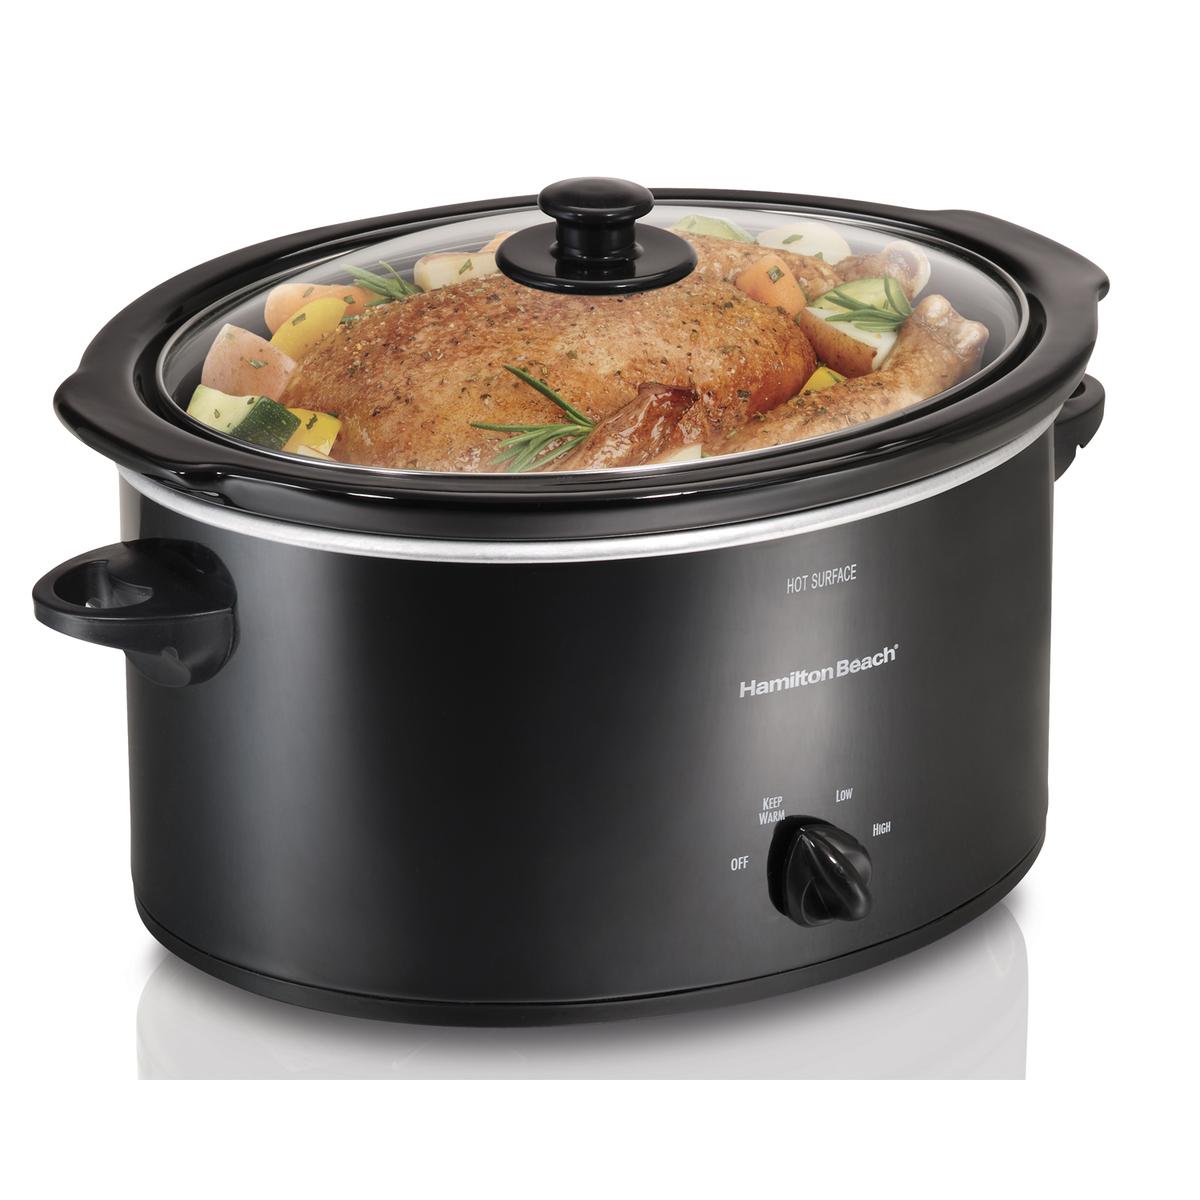 5 Quart Slow Cooker (33154)